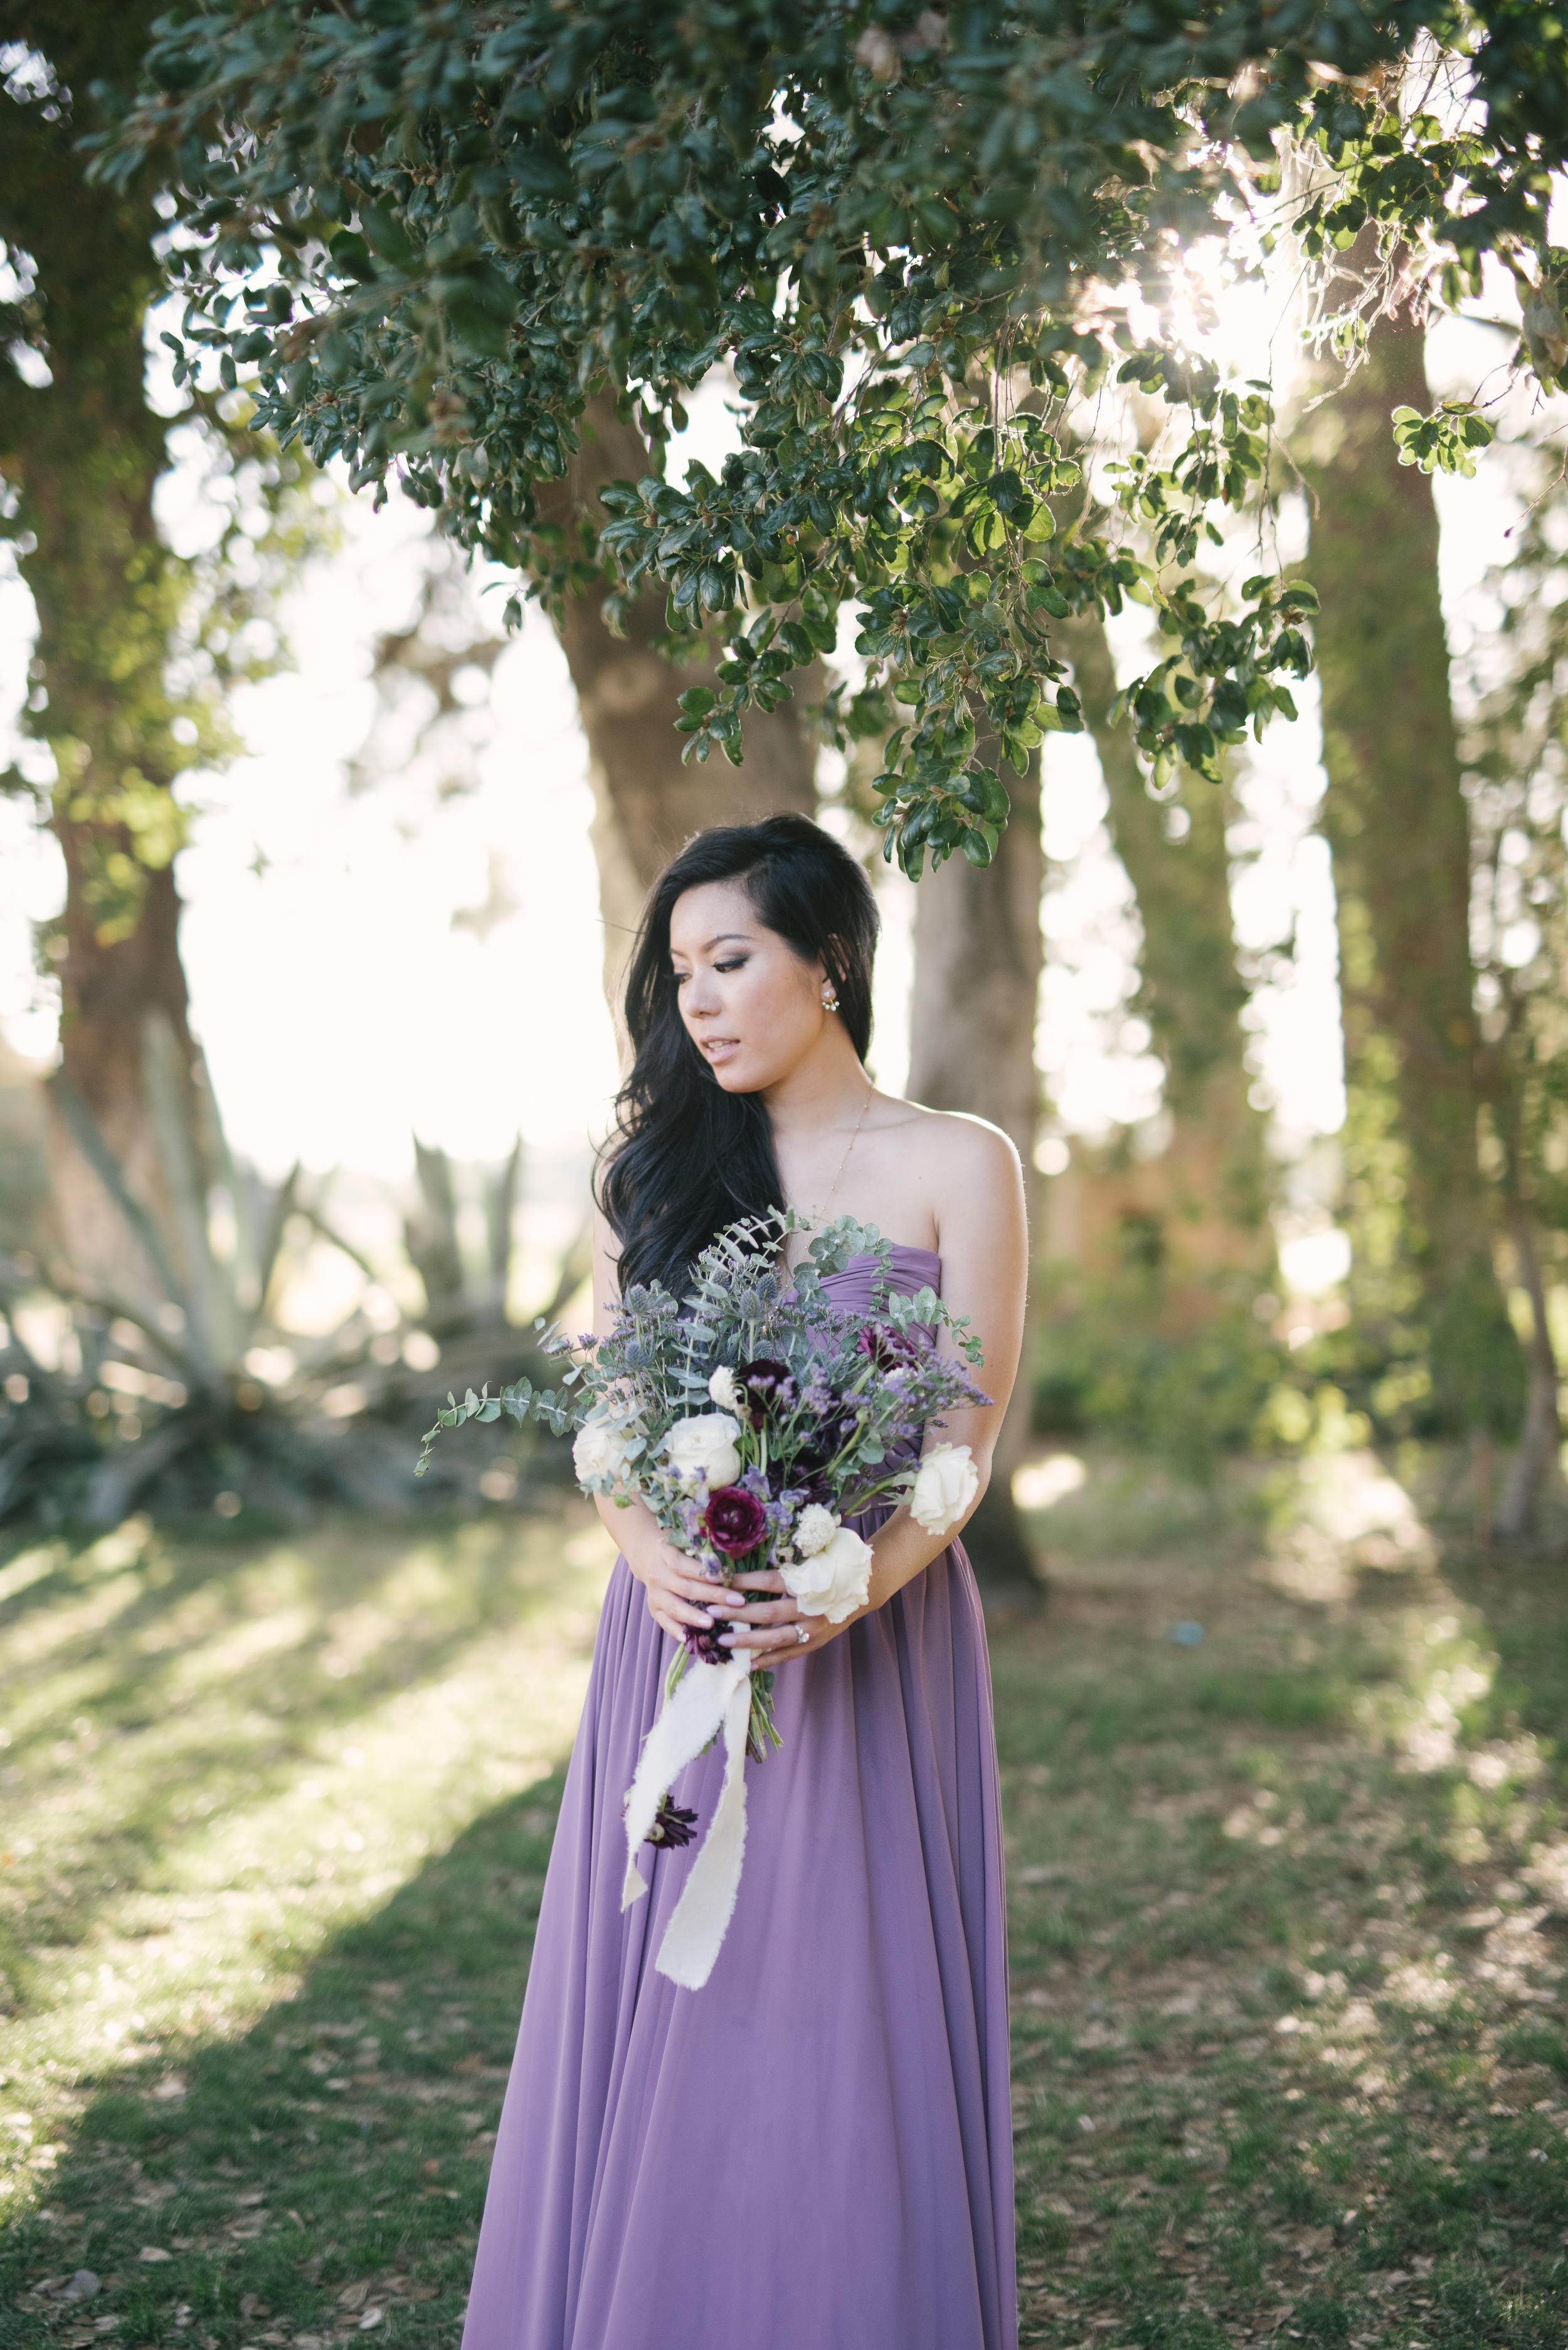 kimmyphong2ndshooter - Carissa Woo Photography-0076.jpg